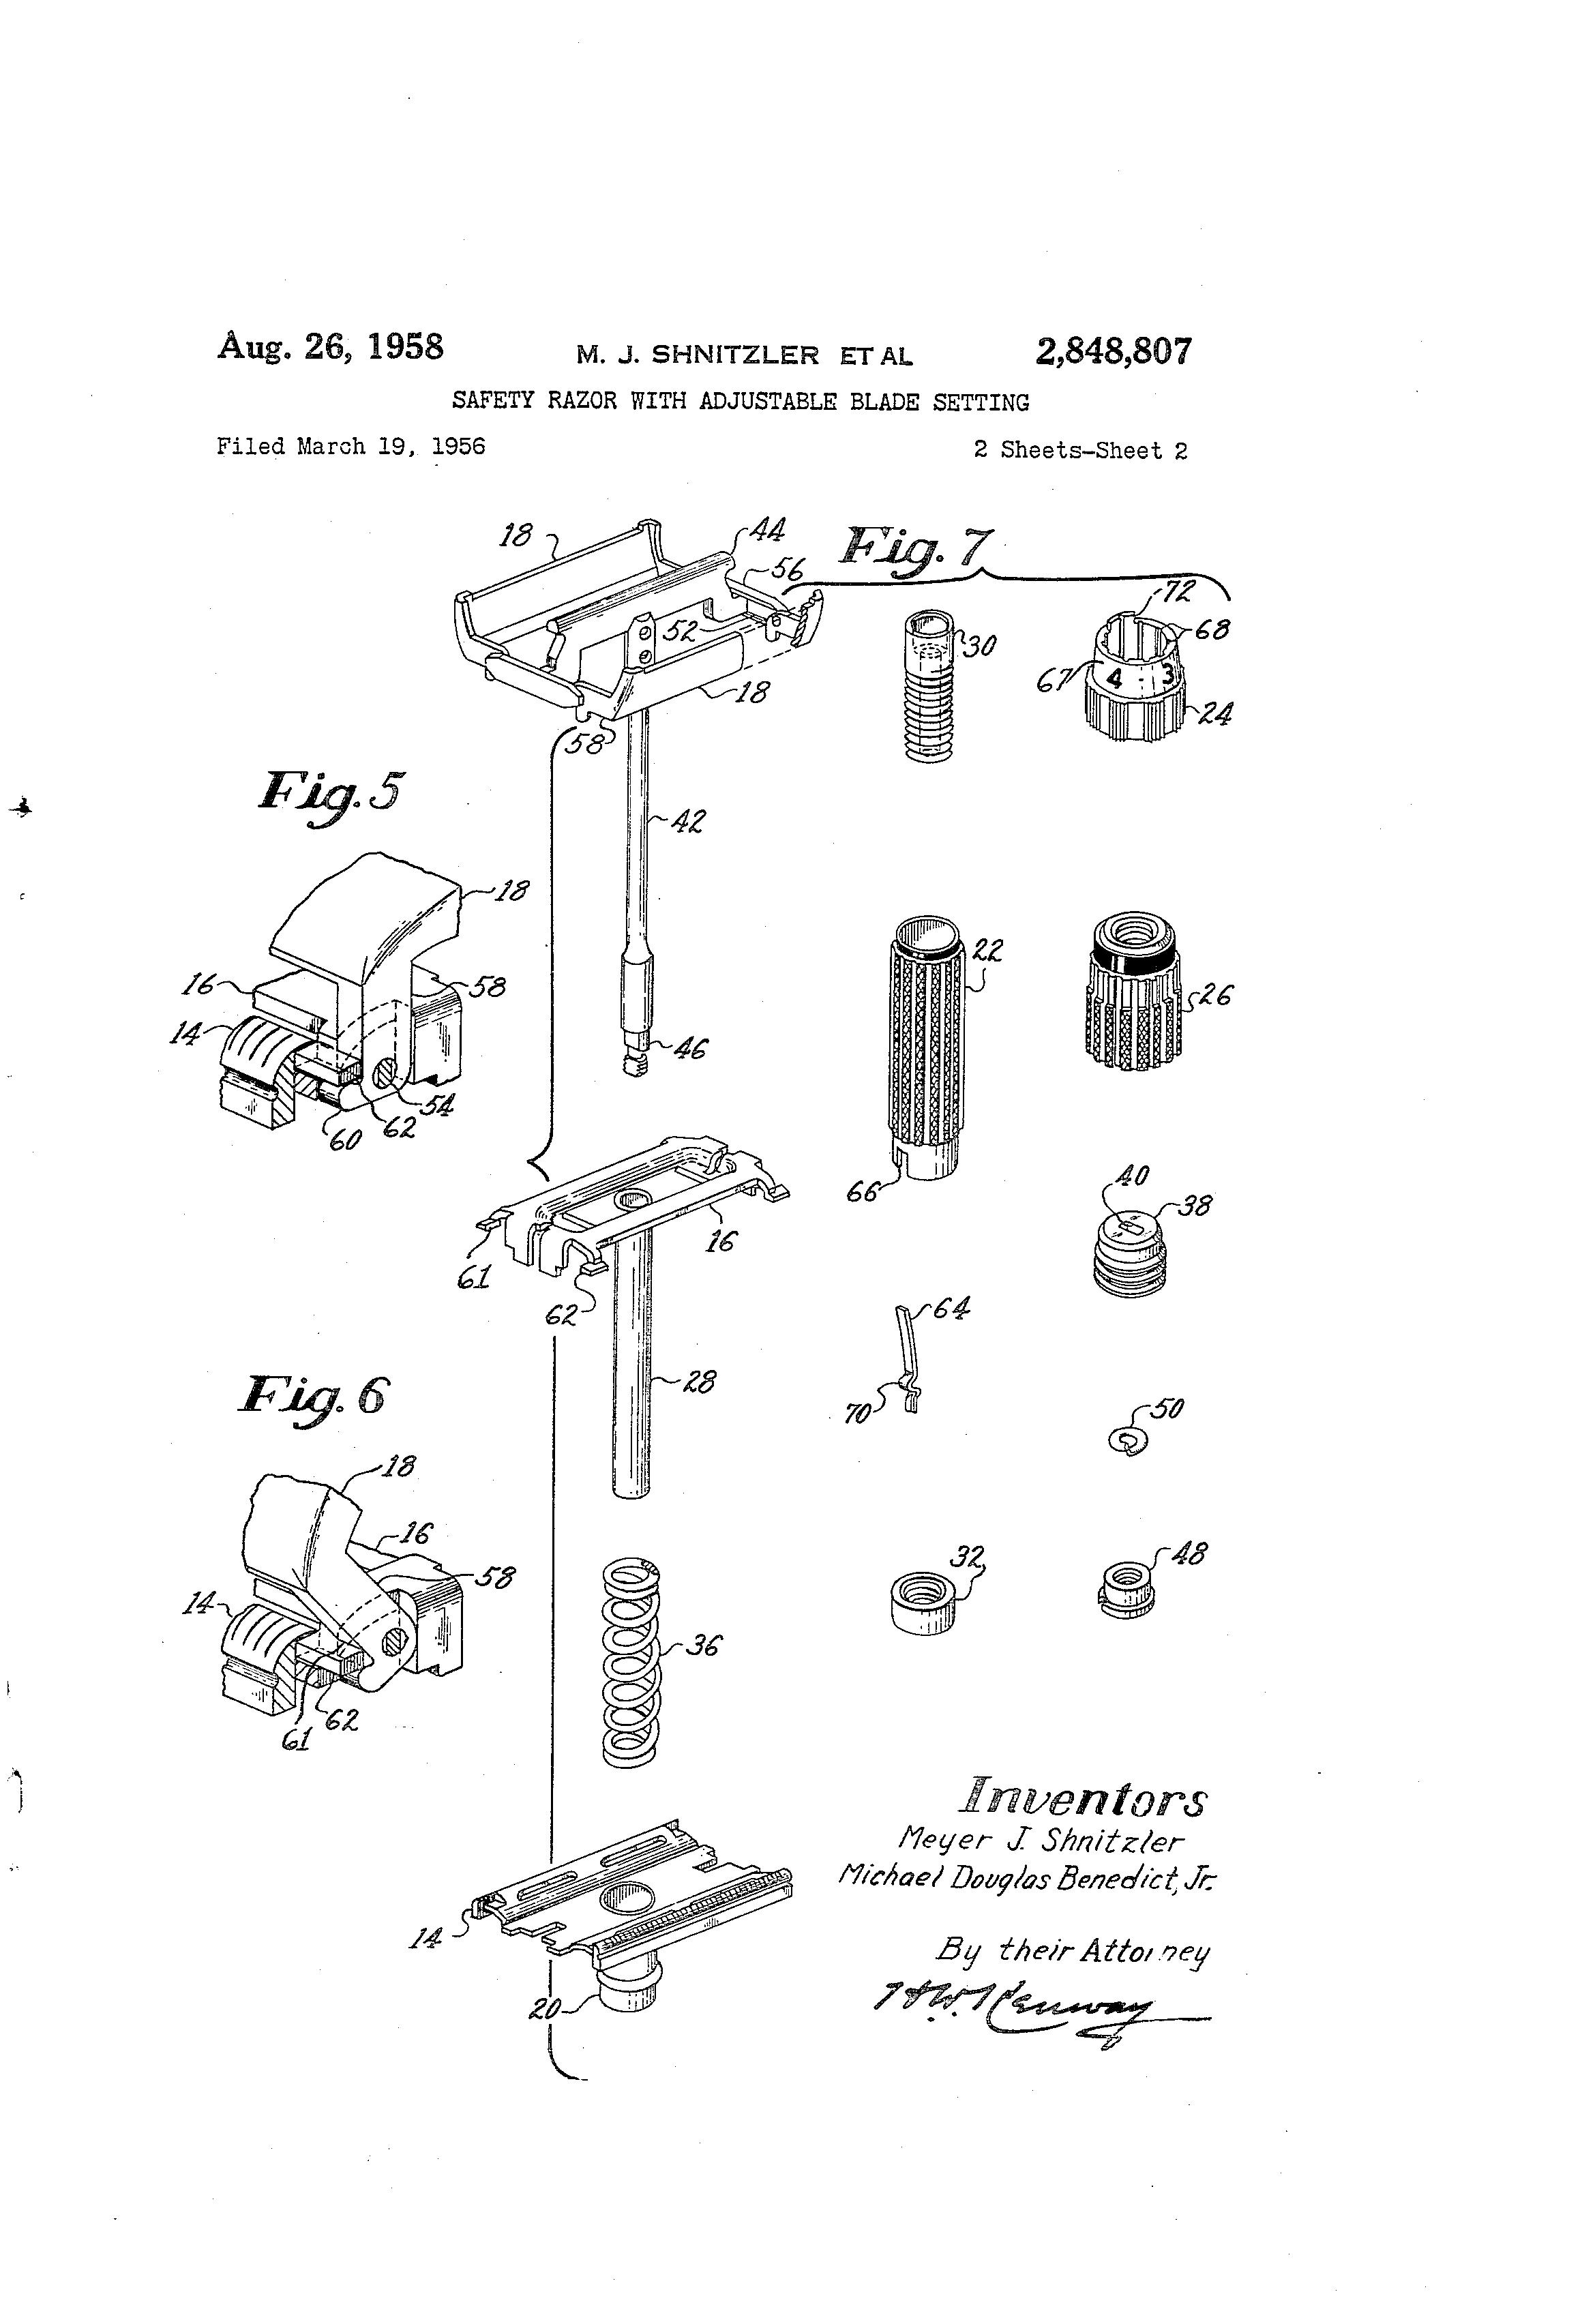 Bottom Dial Patent Diagram